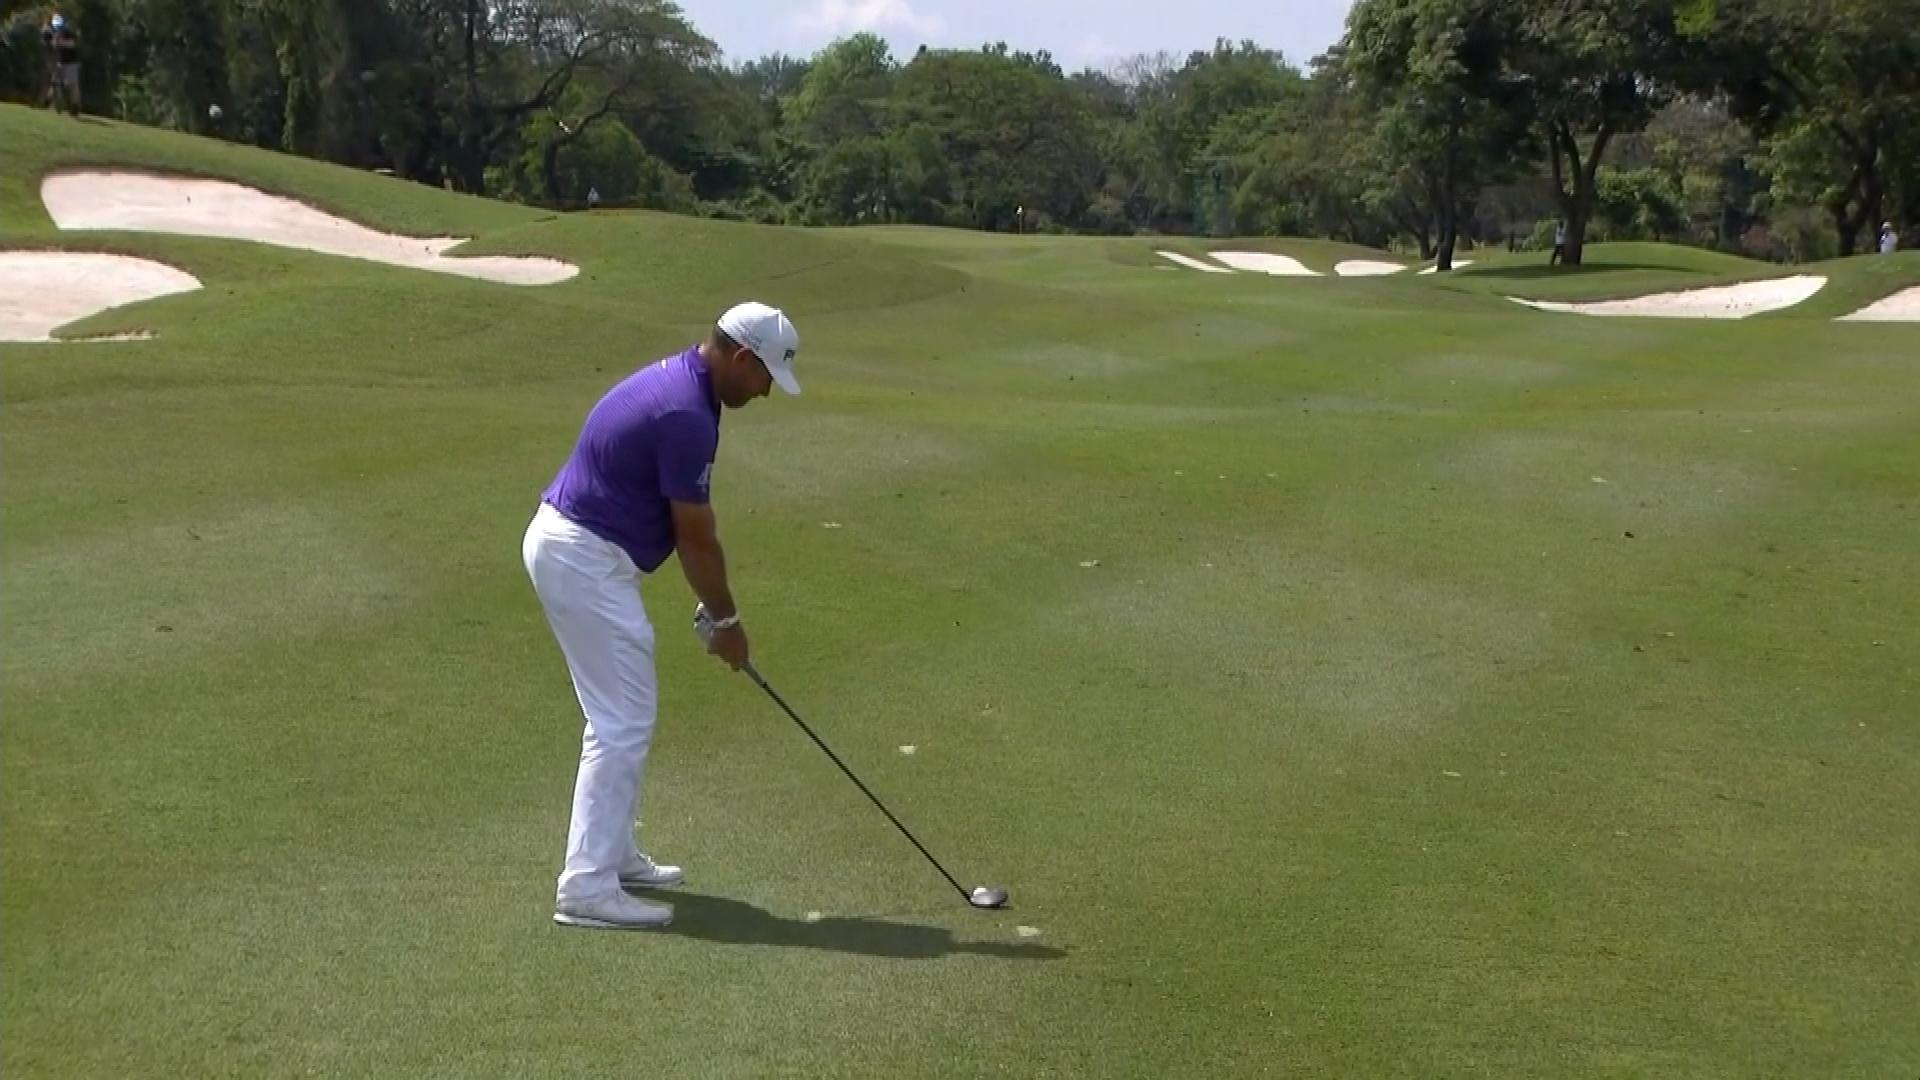 cec05220f4606a http   www.golfchannel.com media guid ...